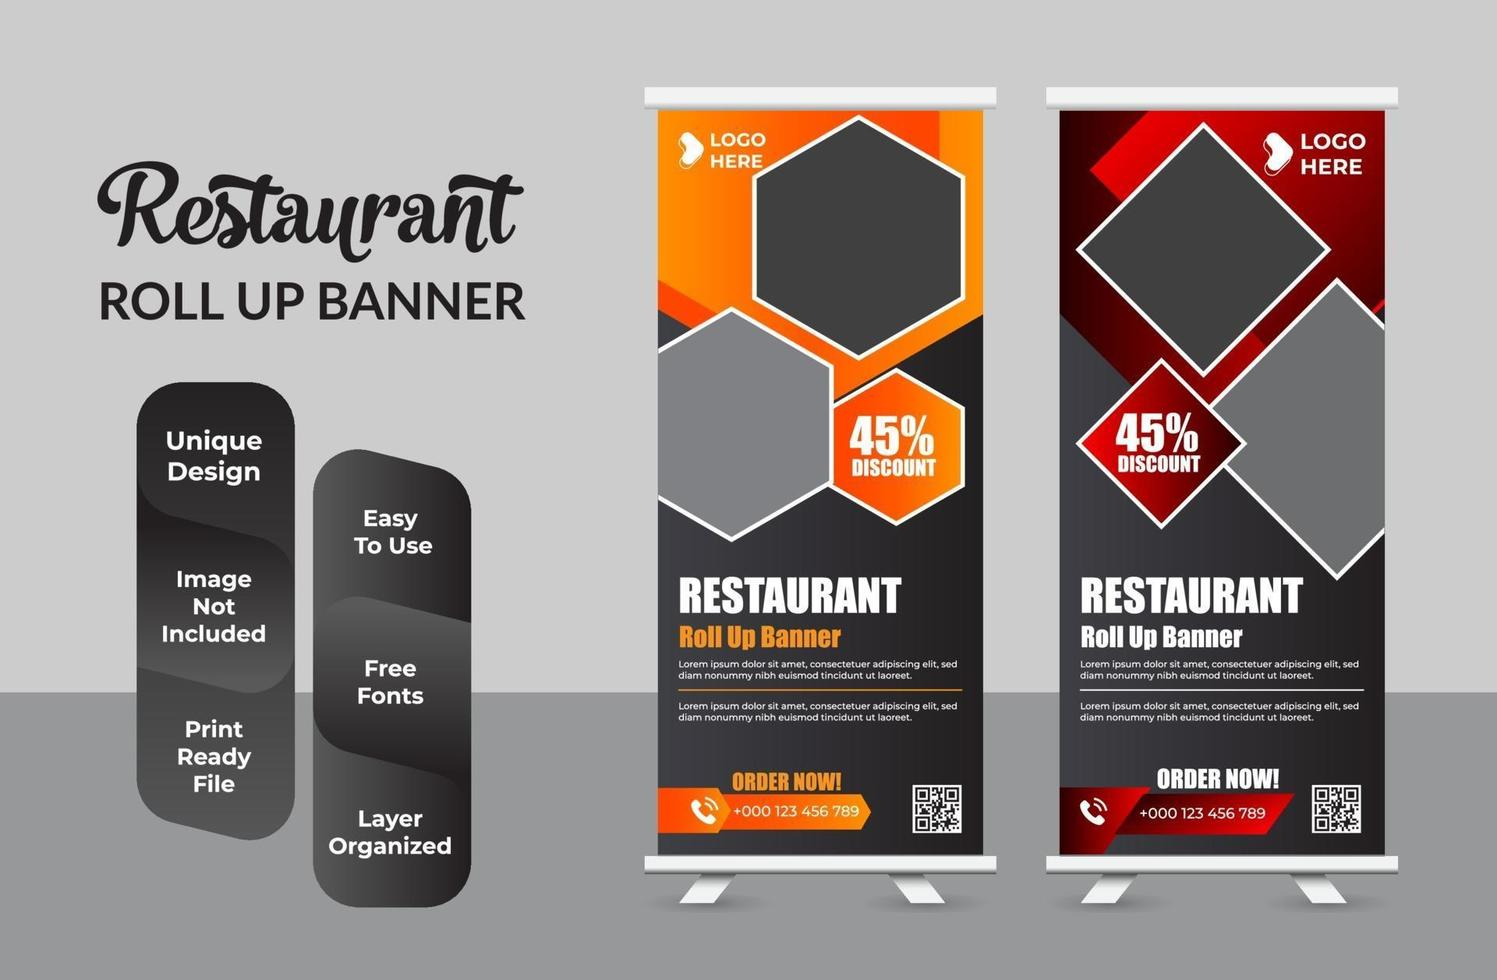 Conjunto de plantillas de paquete de banner enrollable de comida de restaurante creativo vector